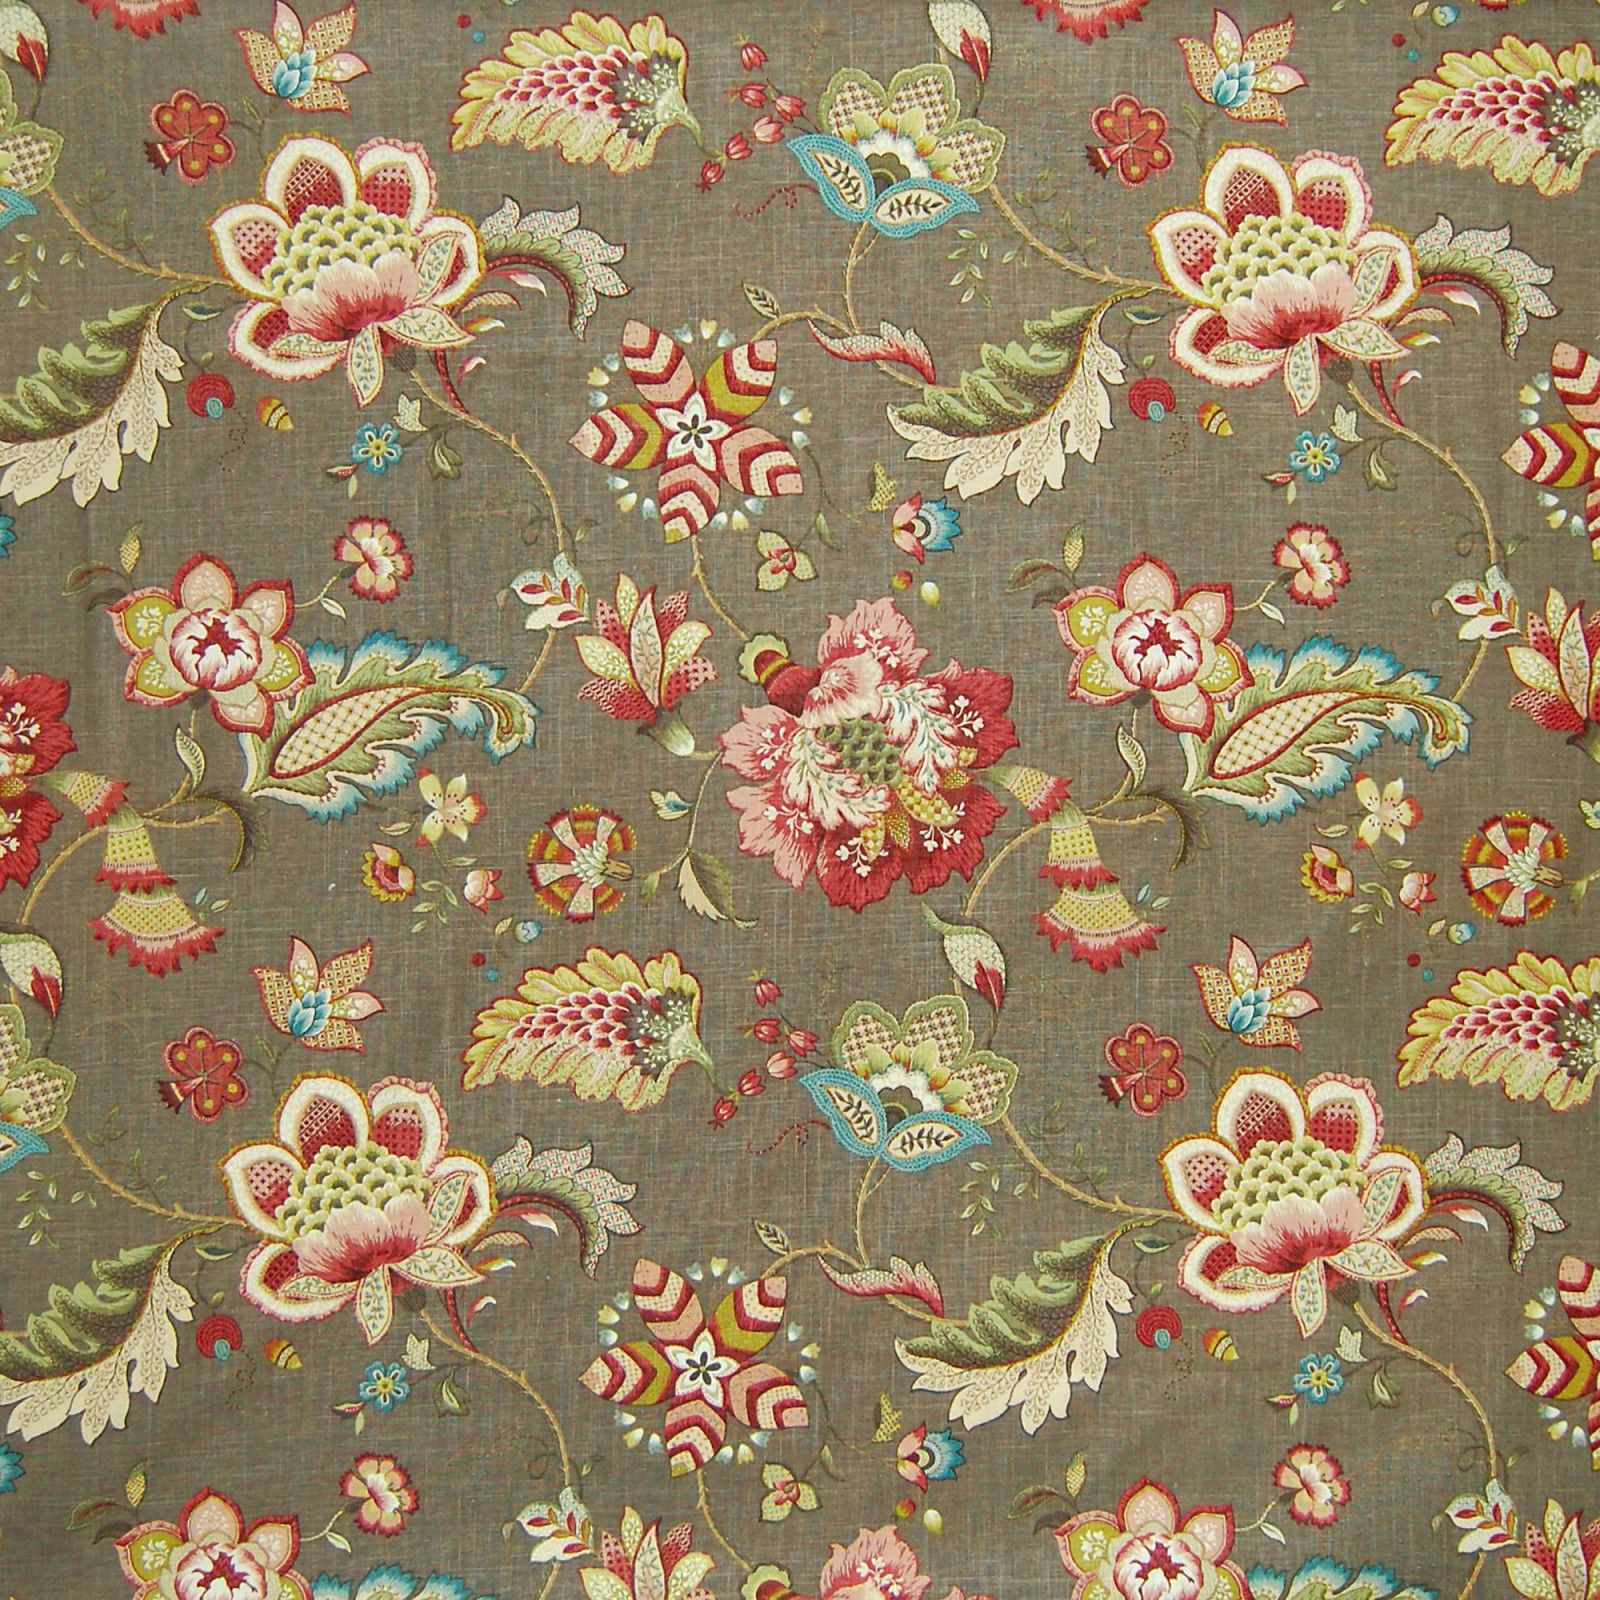 Fabric Decor, Drapery Fabric, Waverly Fabric